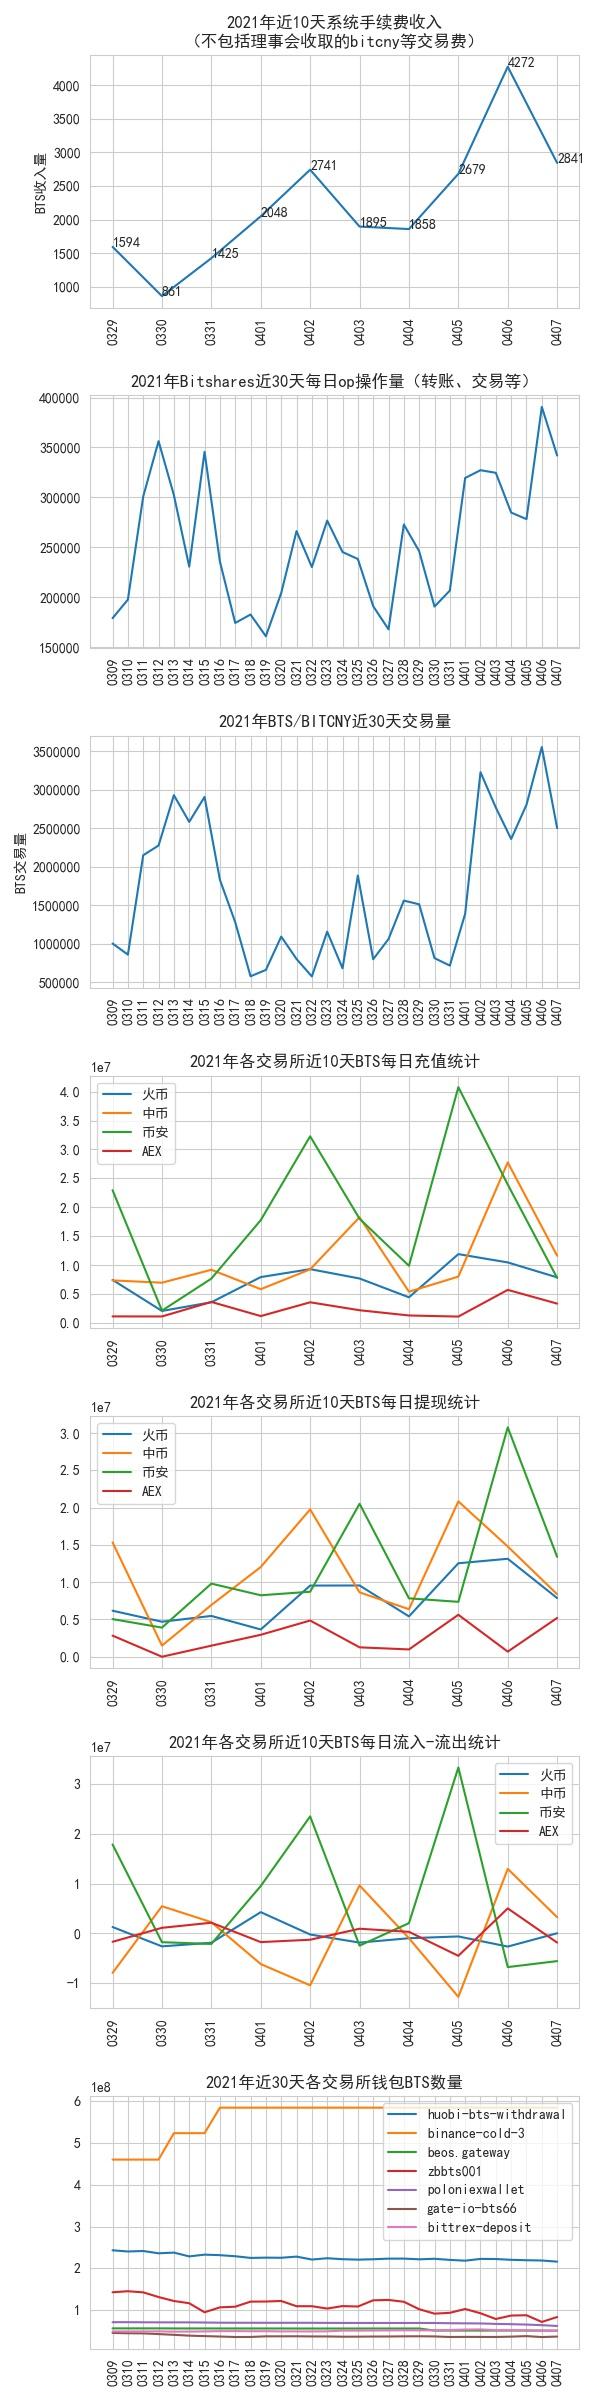 bitshares_data_2021-04-07.jpg